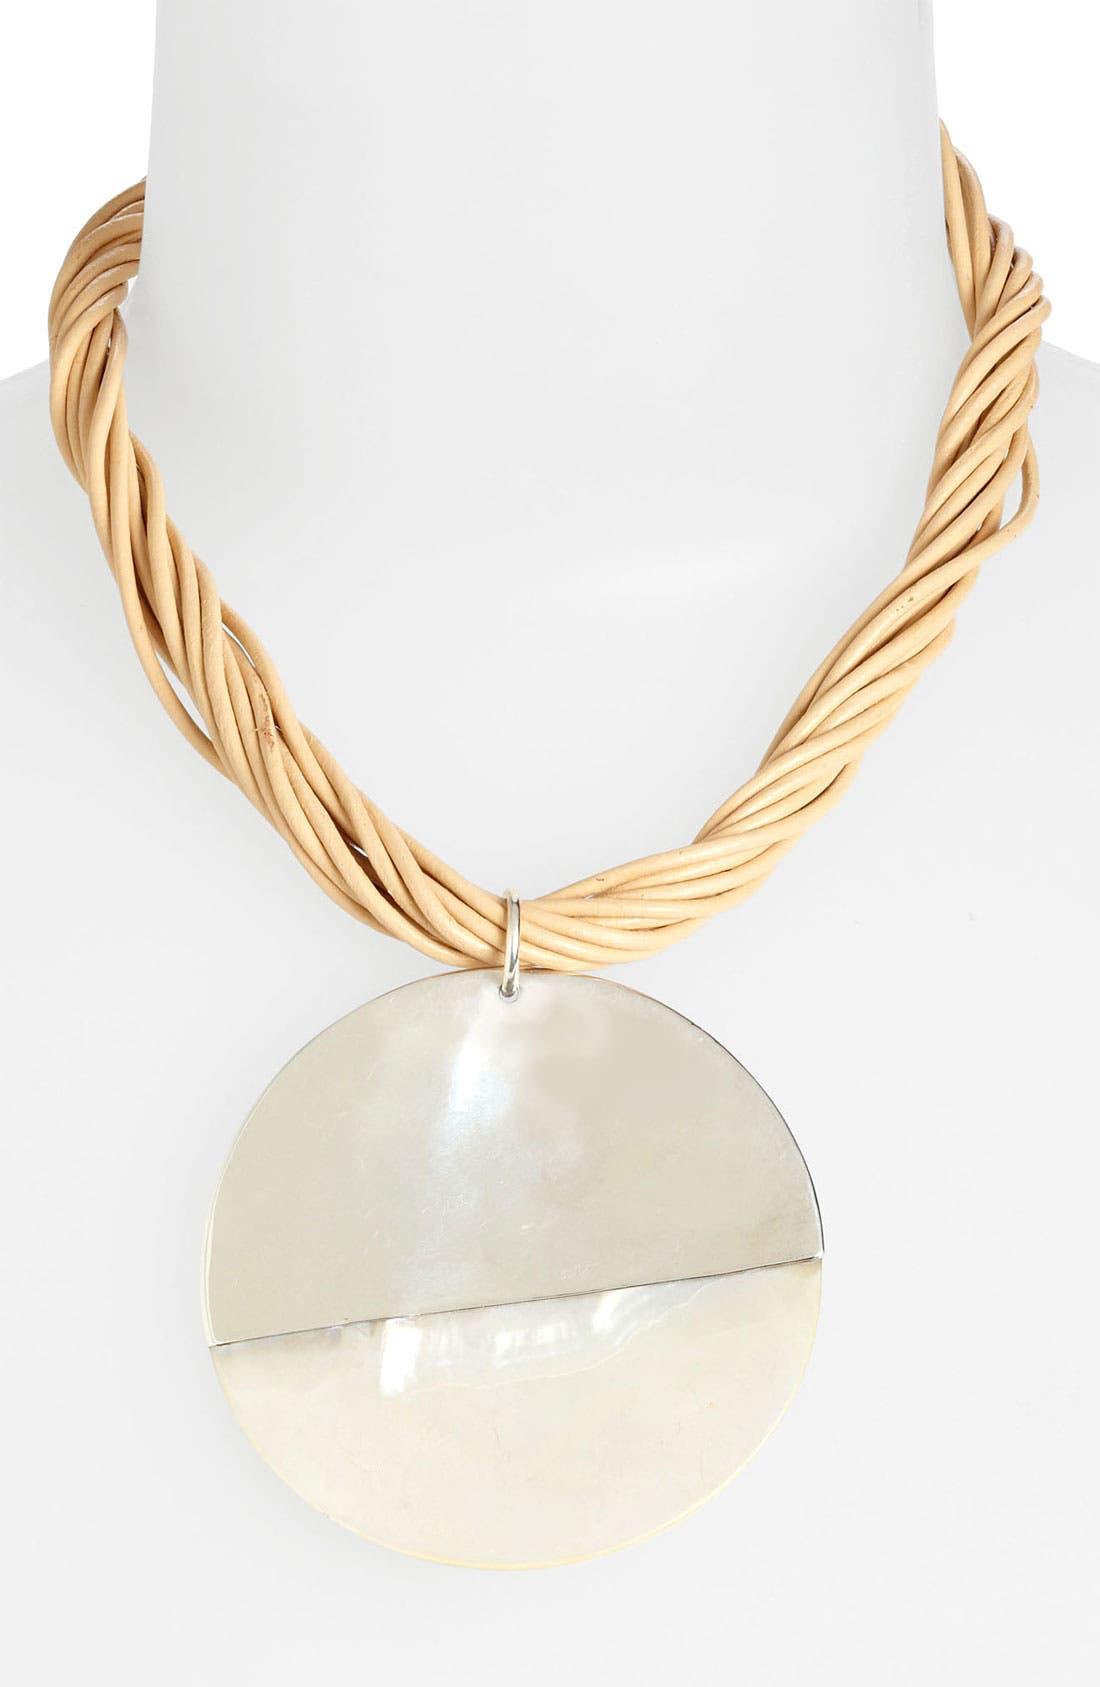 Main Image - Simon Sebbag 'Bora Bora' Leather Pendant Necklace